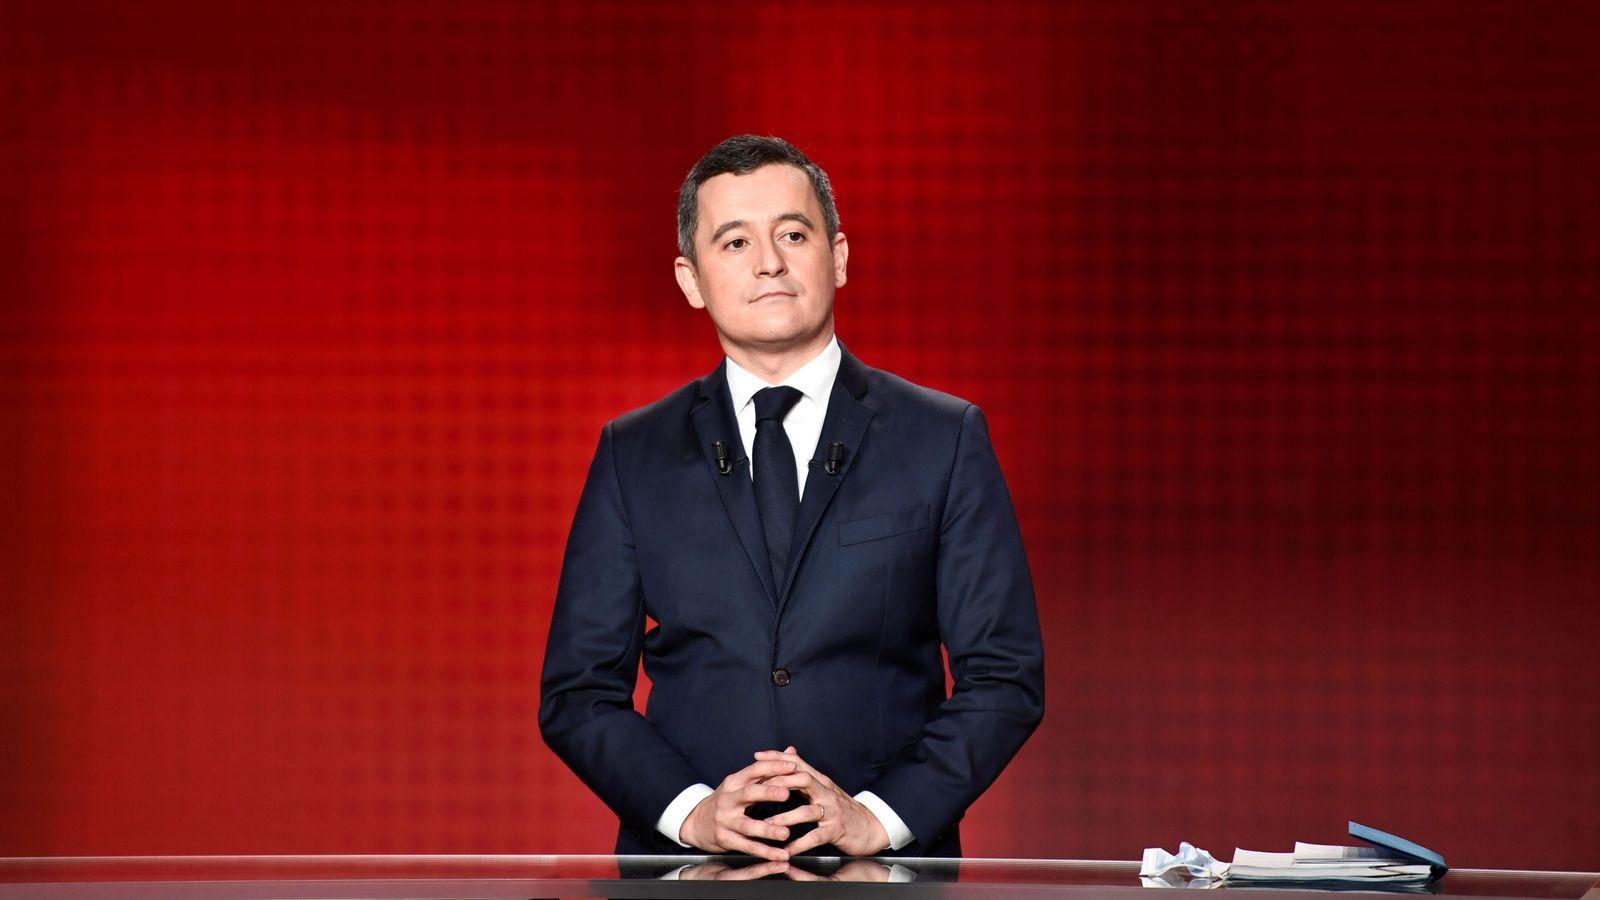 FRANCE-POLITICS-GOVERNMENT-MEDIA-TV